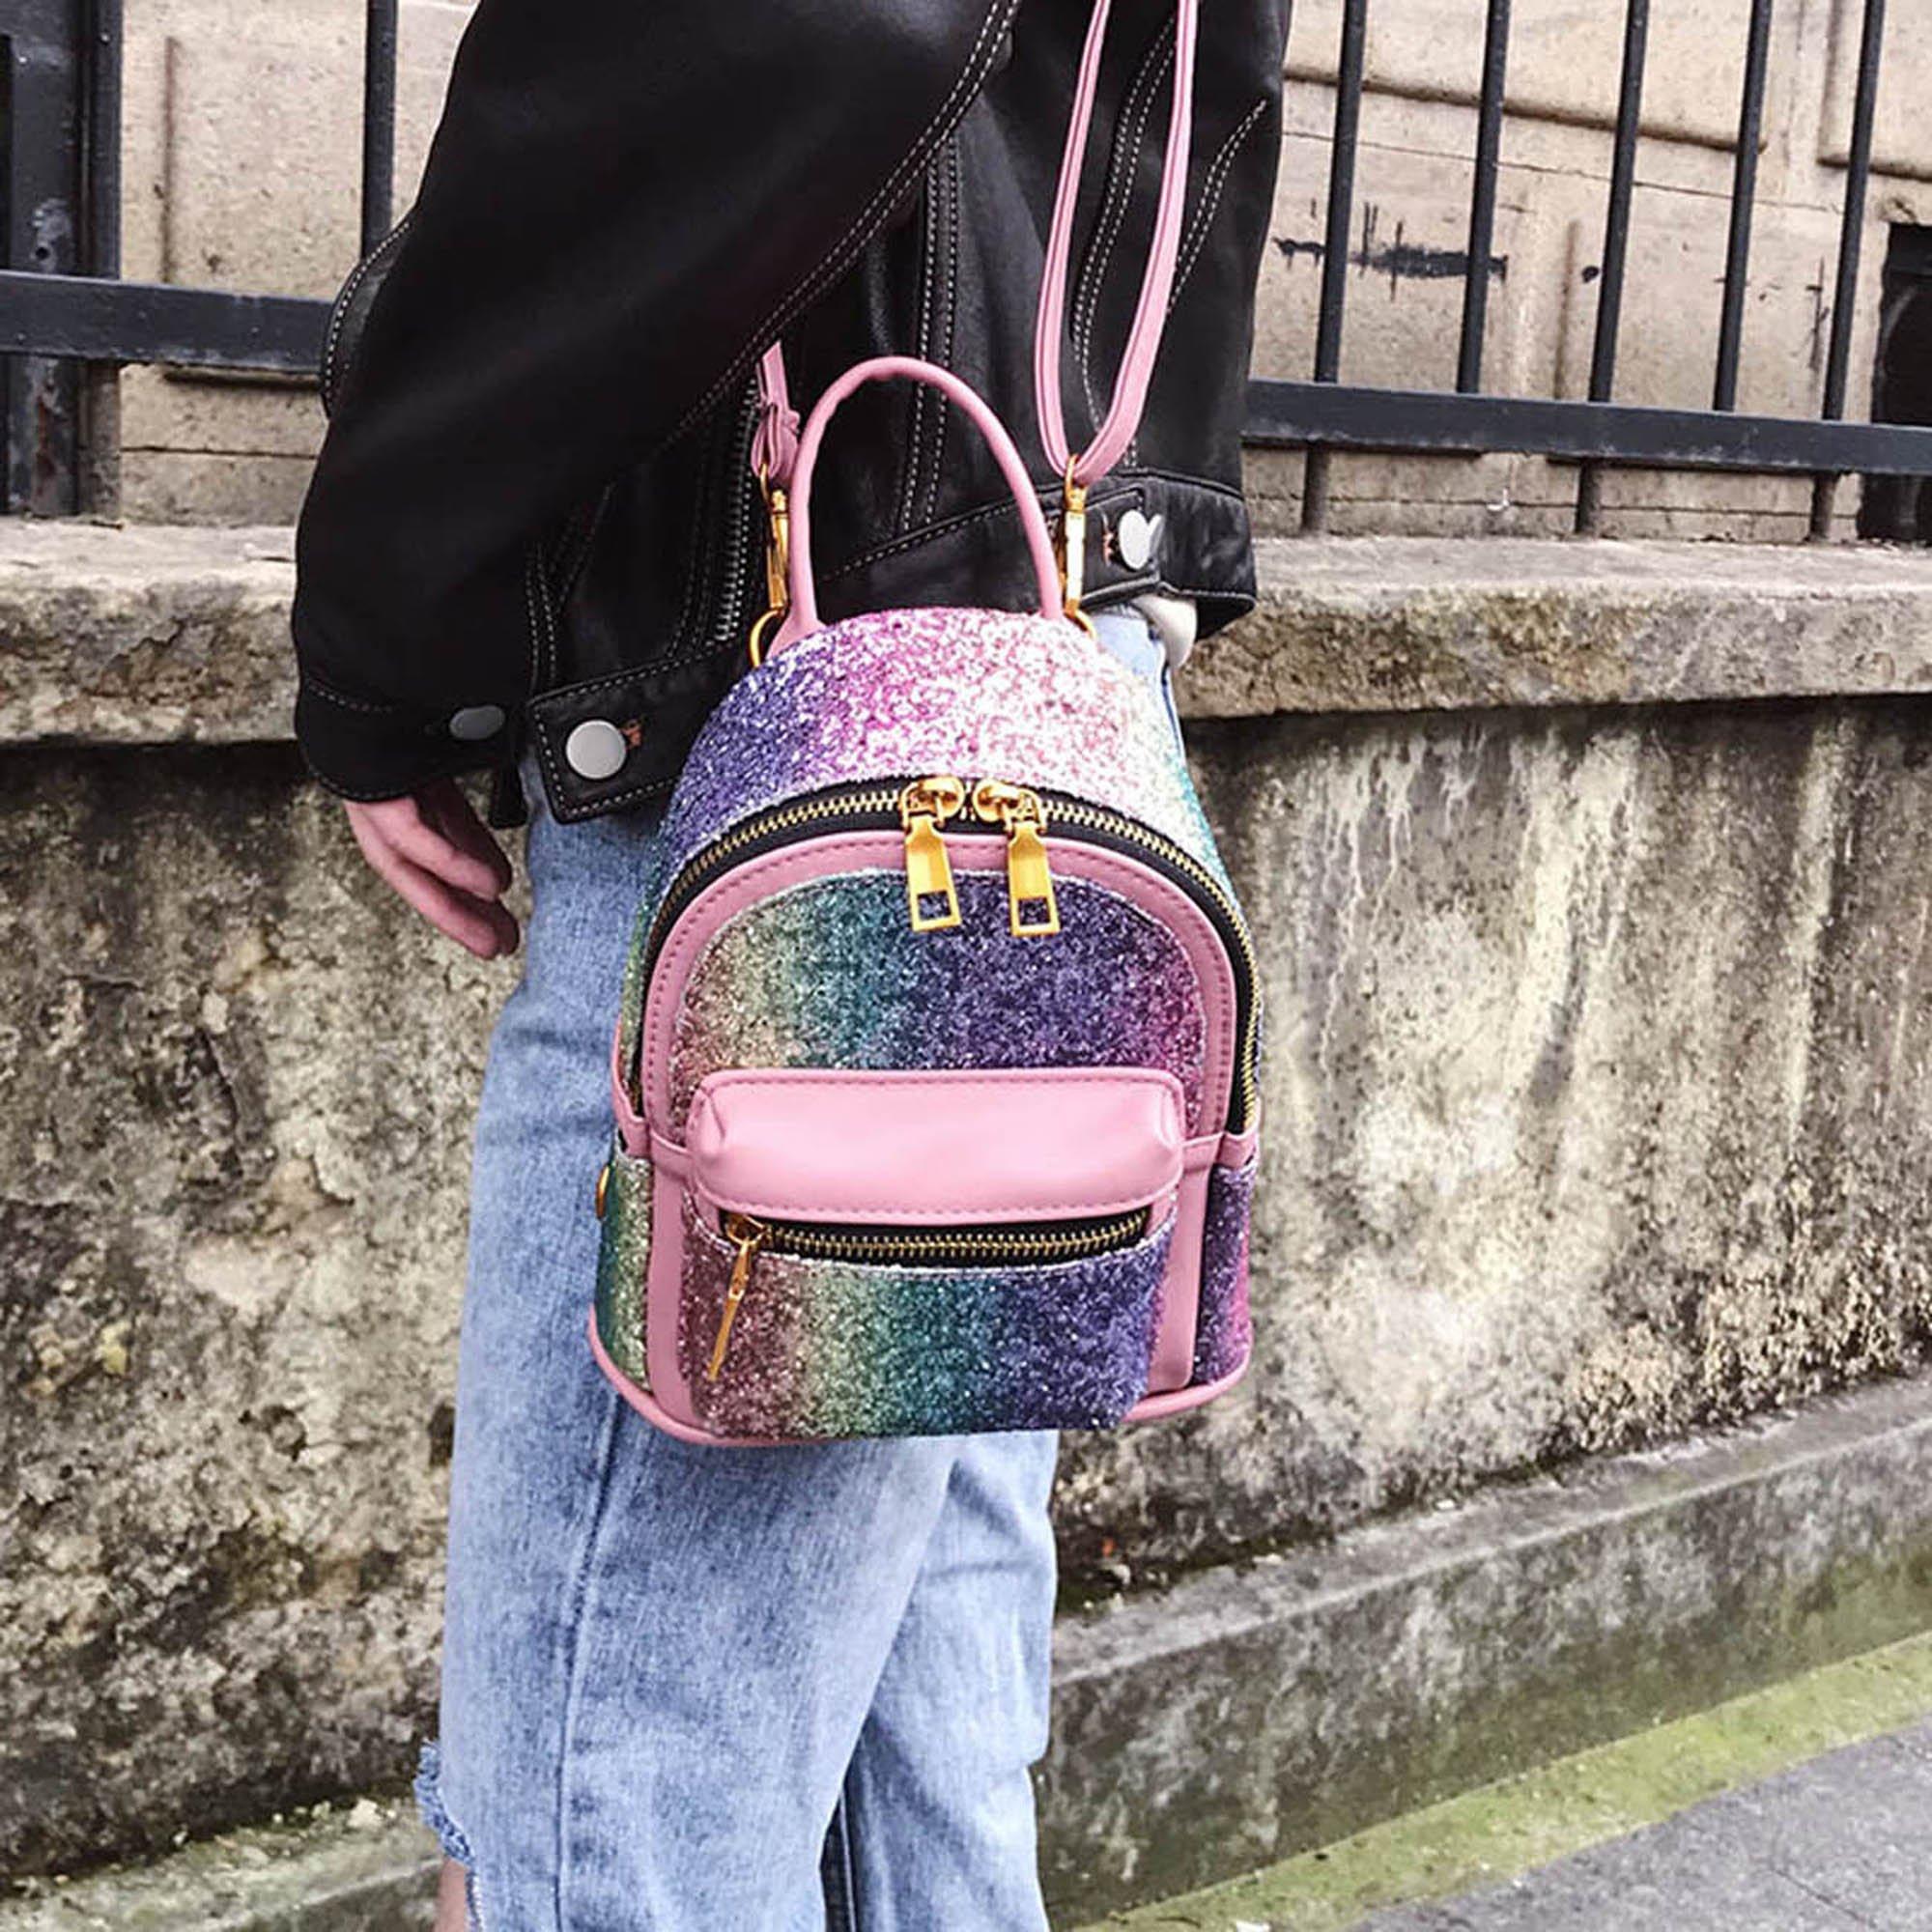 Girls Bling Mini Travel Backpack Kids Children School Bags Satchel Purses Daypack (pink rainbow) by JIANBAO (Image #5)